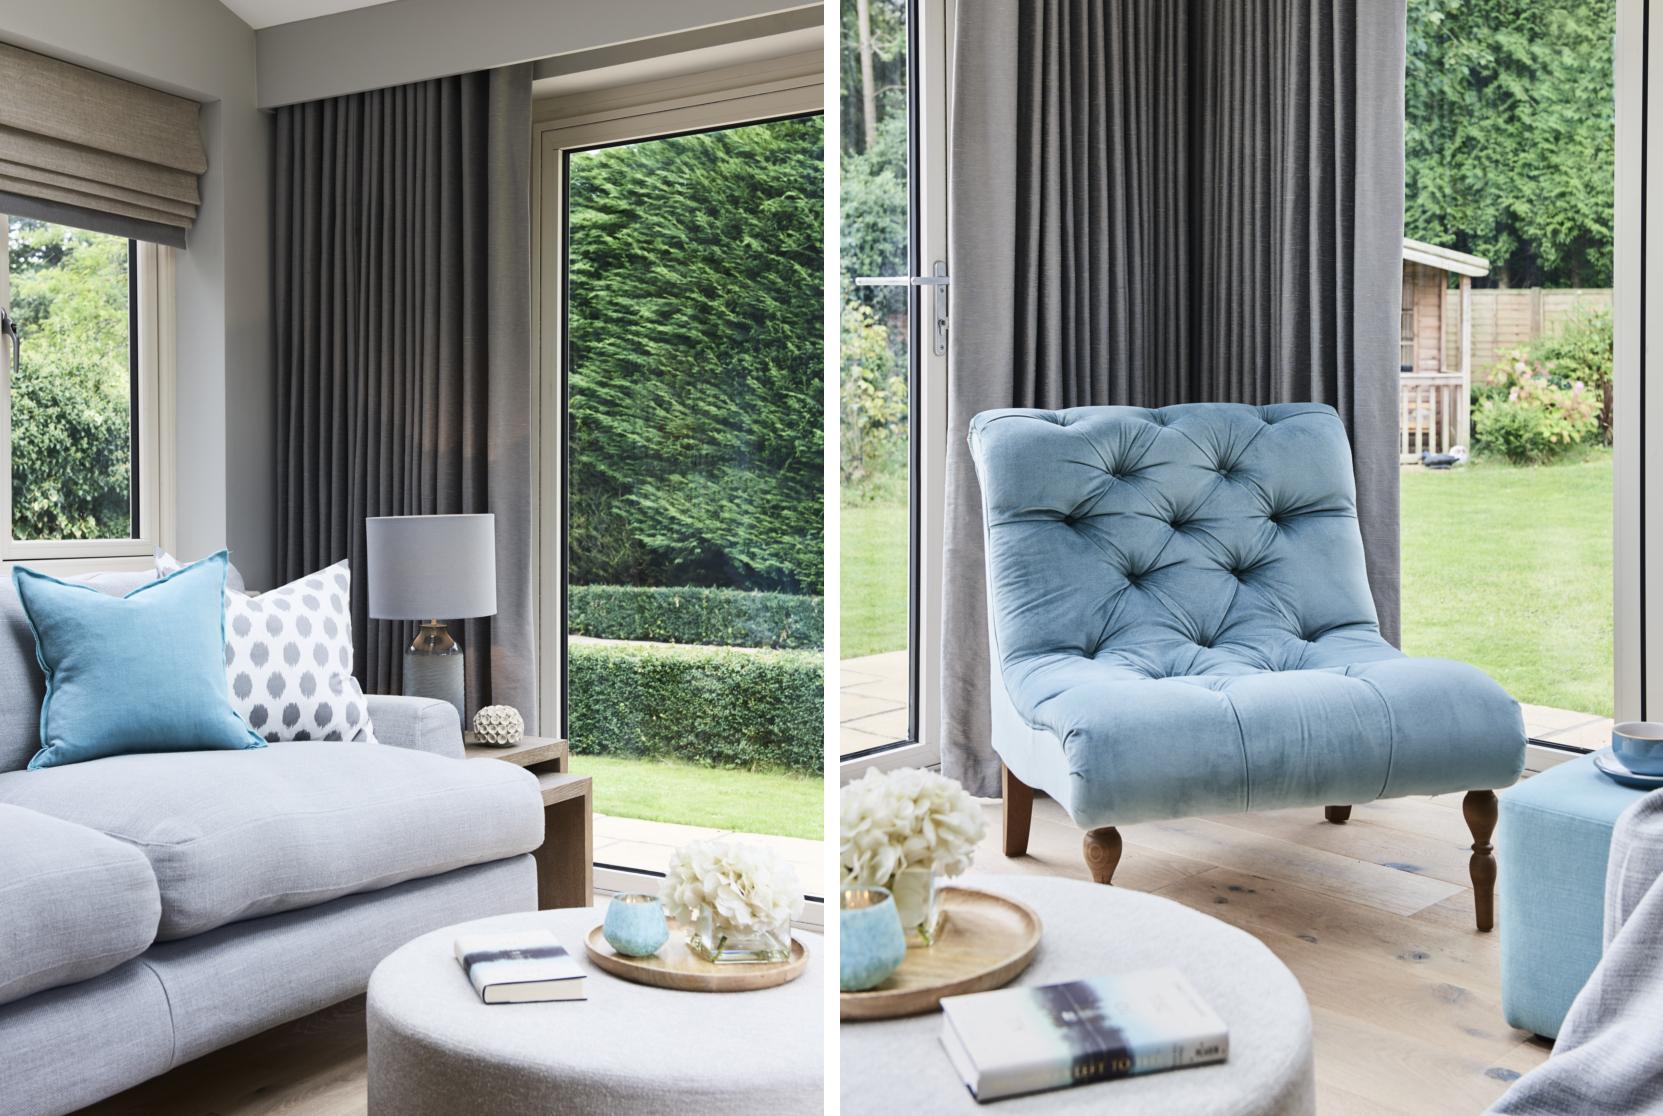 Claire-Garner-Interiors-Linden-House-9